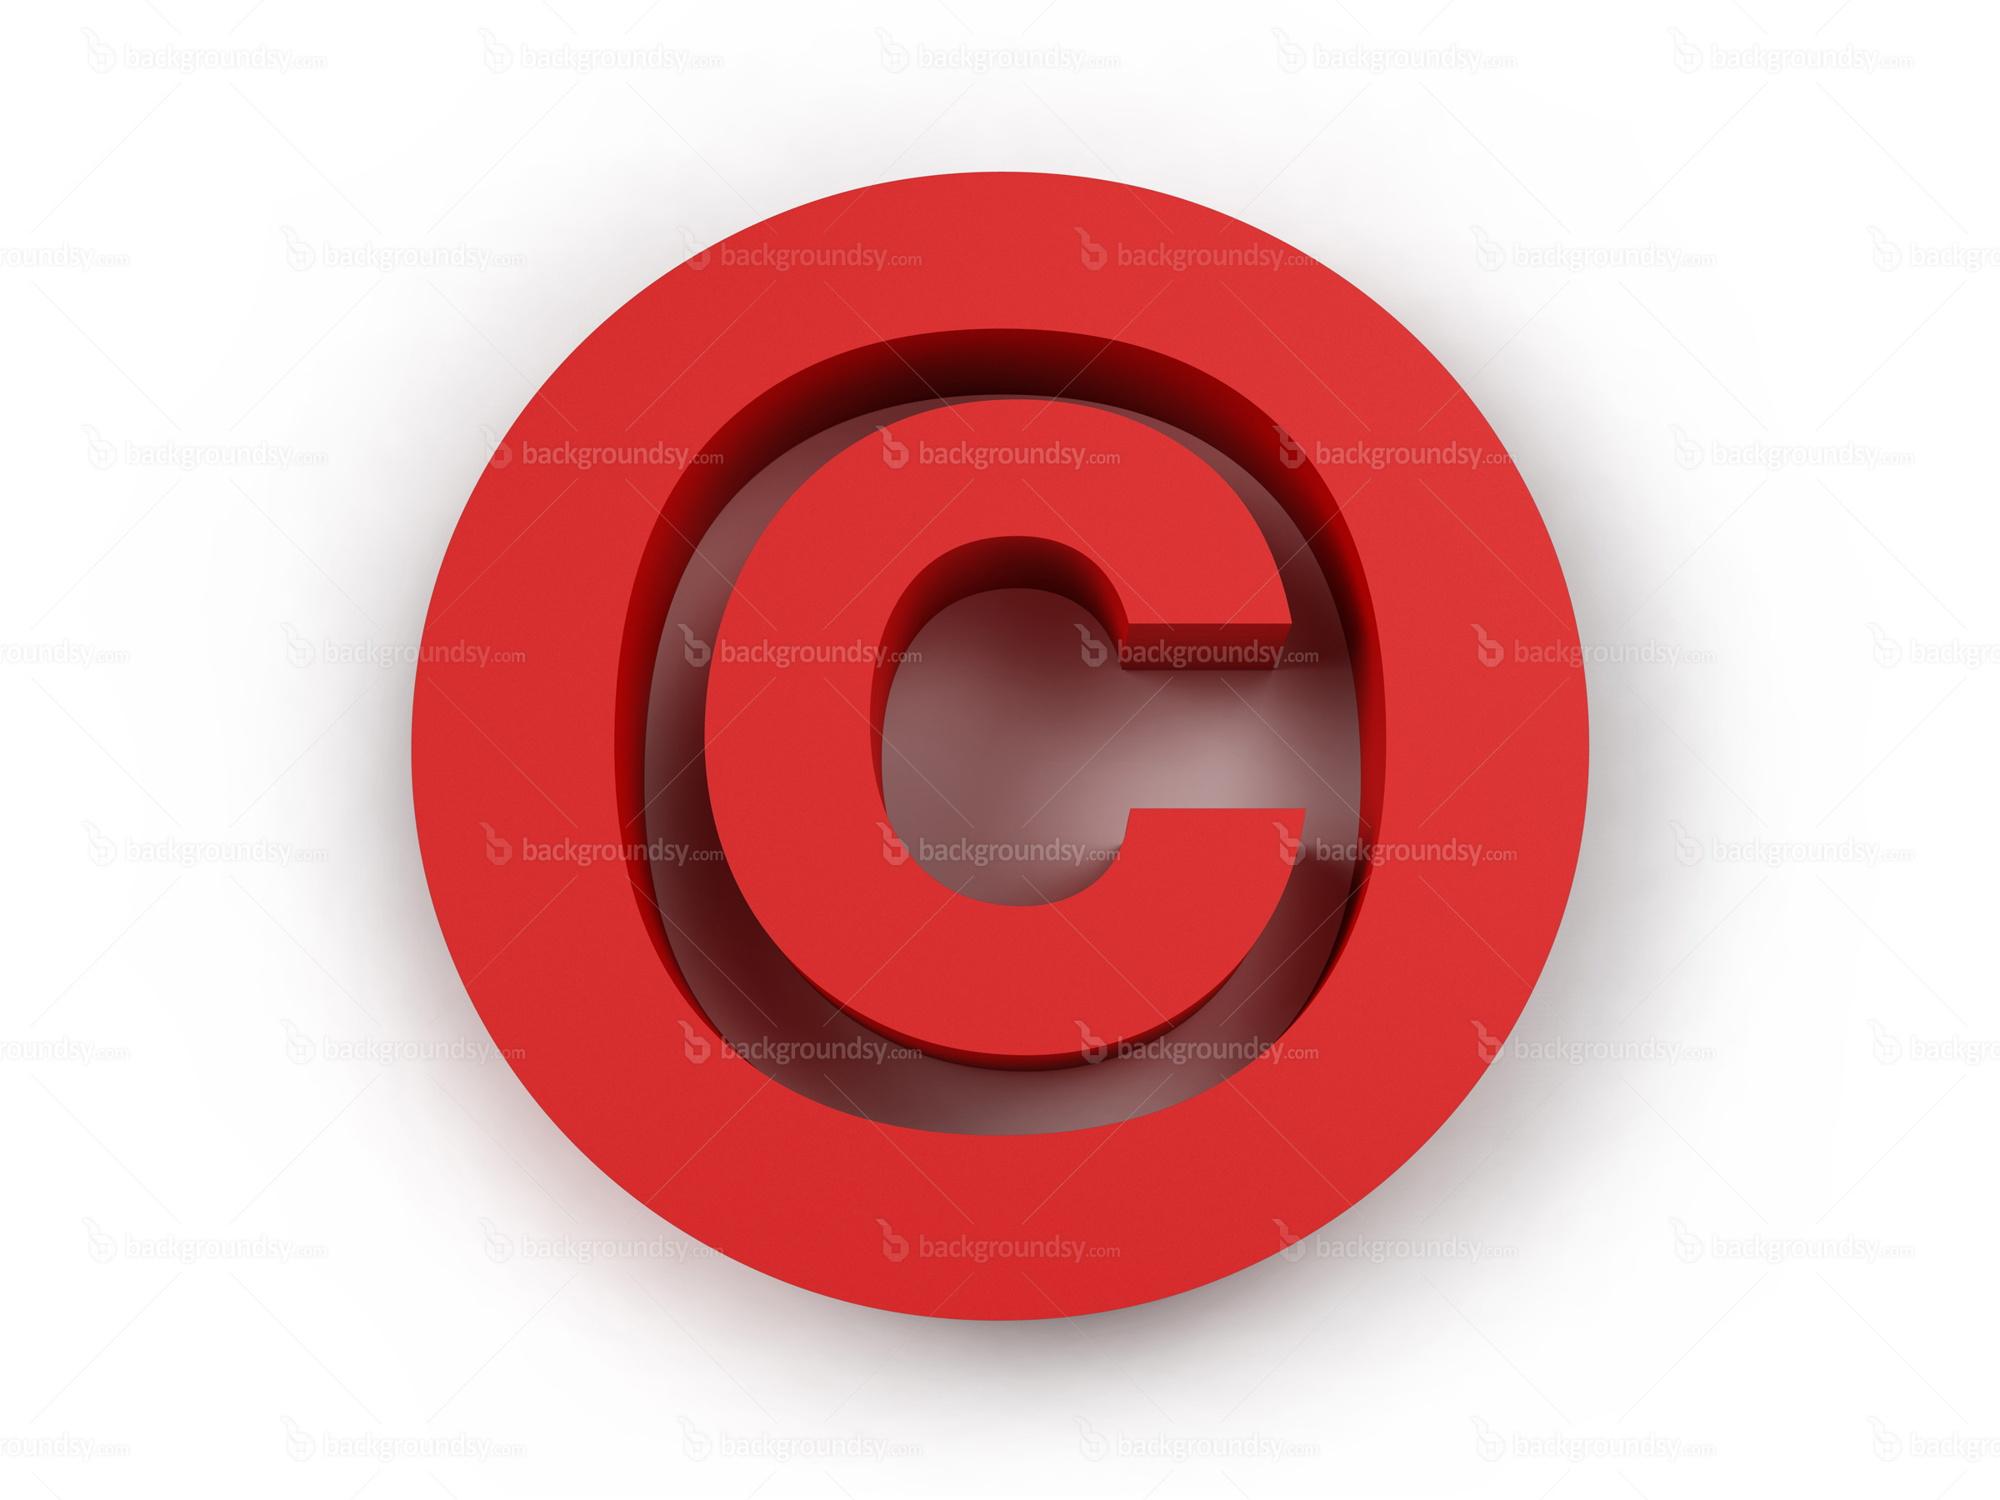 Copyright Symbol Backgroundsy